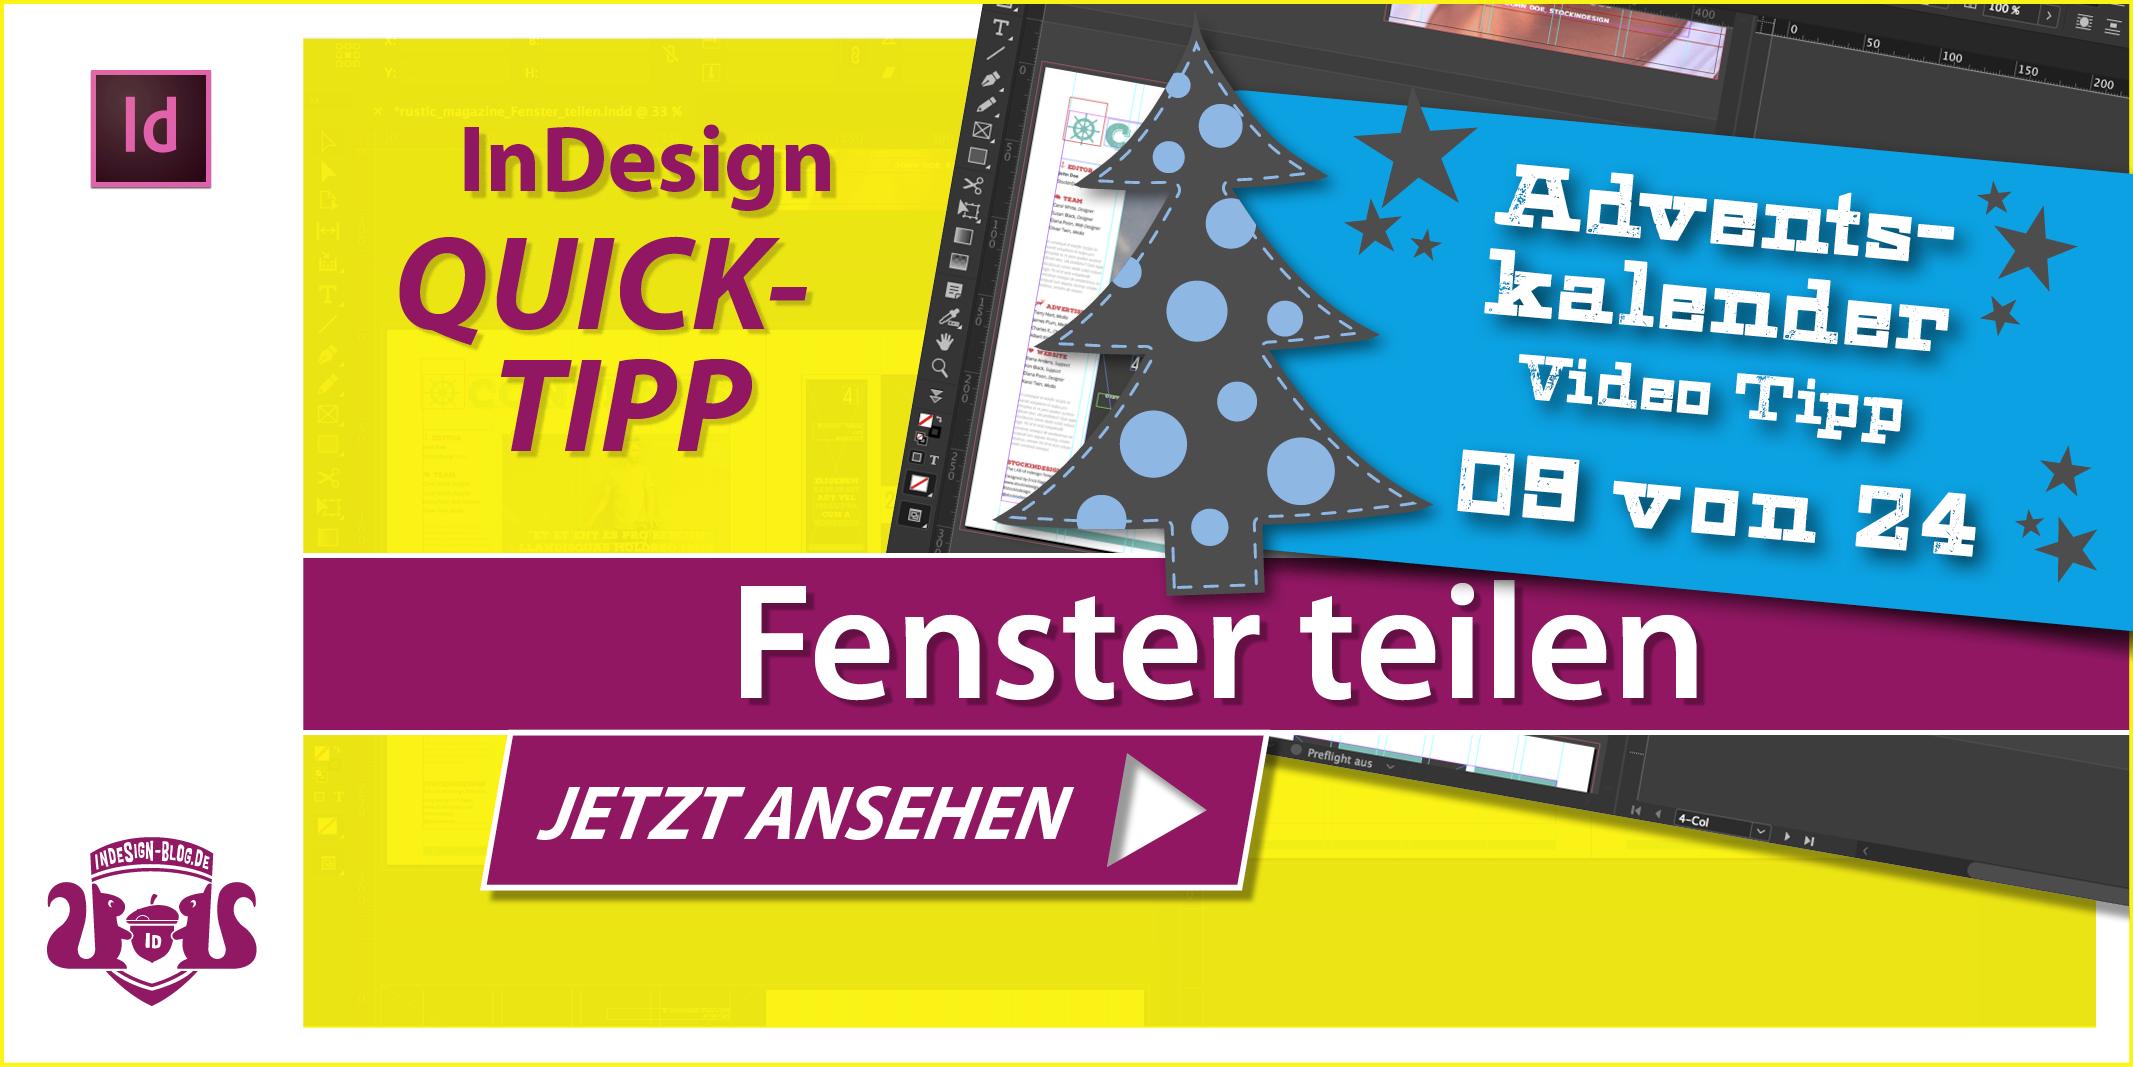 Thumbnail Quicktipp Fenster teilen in InDesign